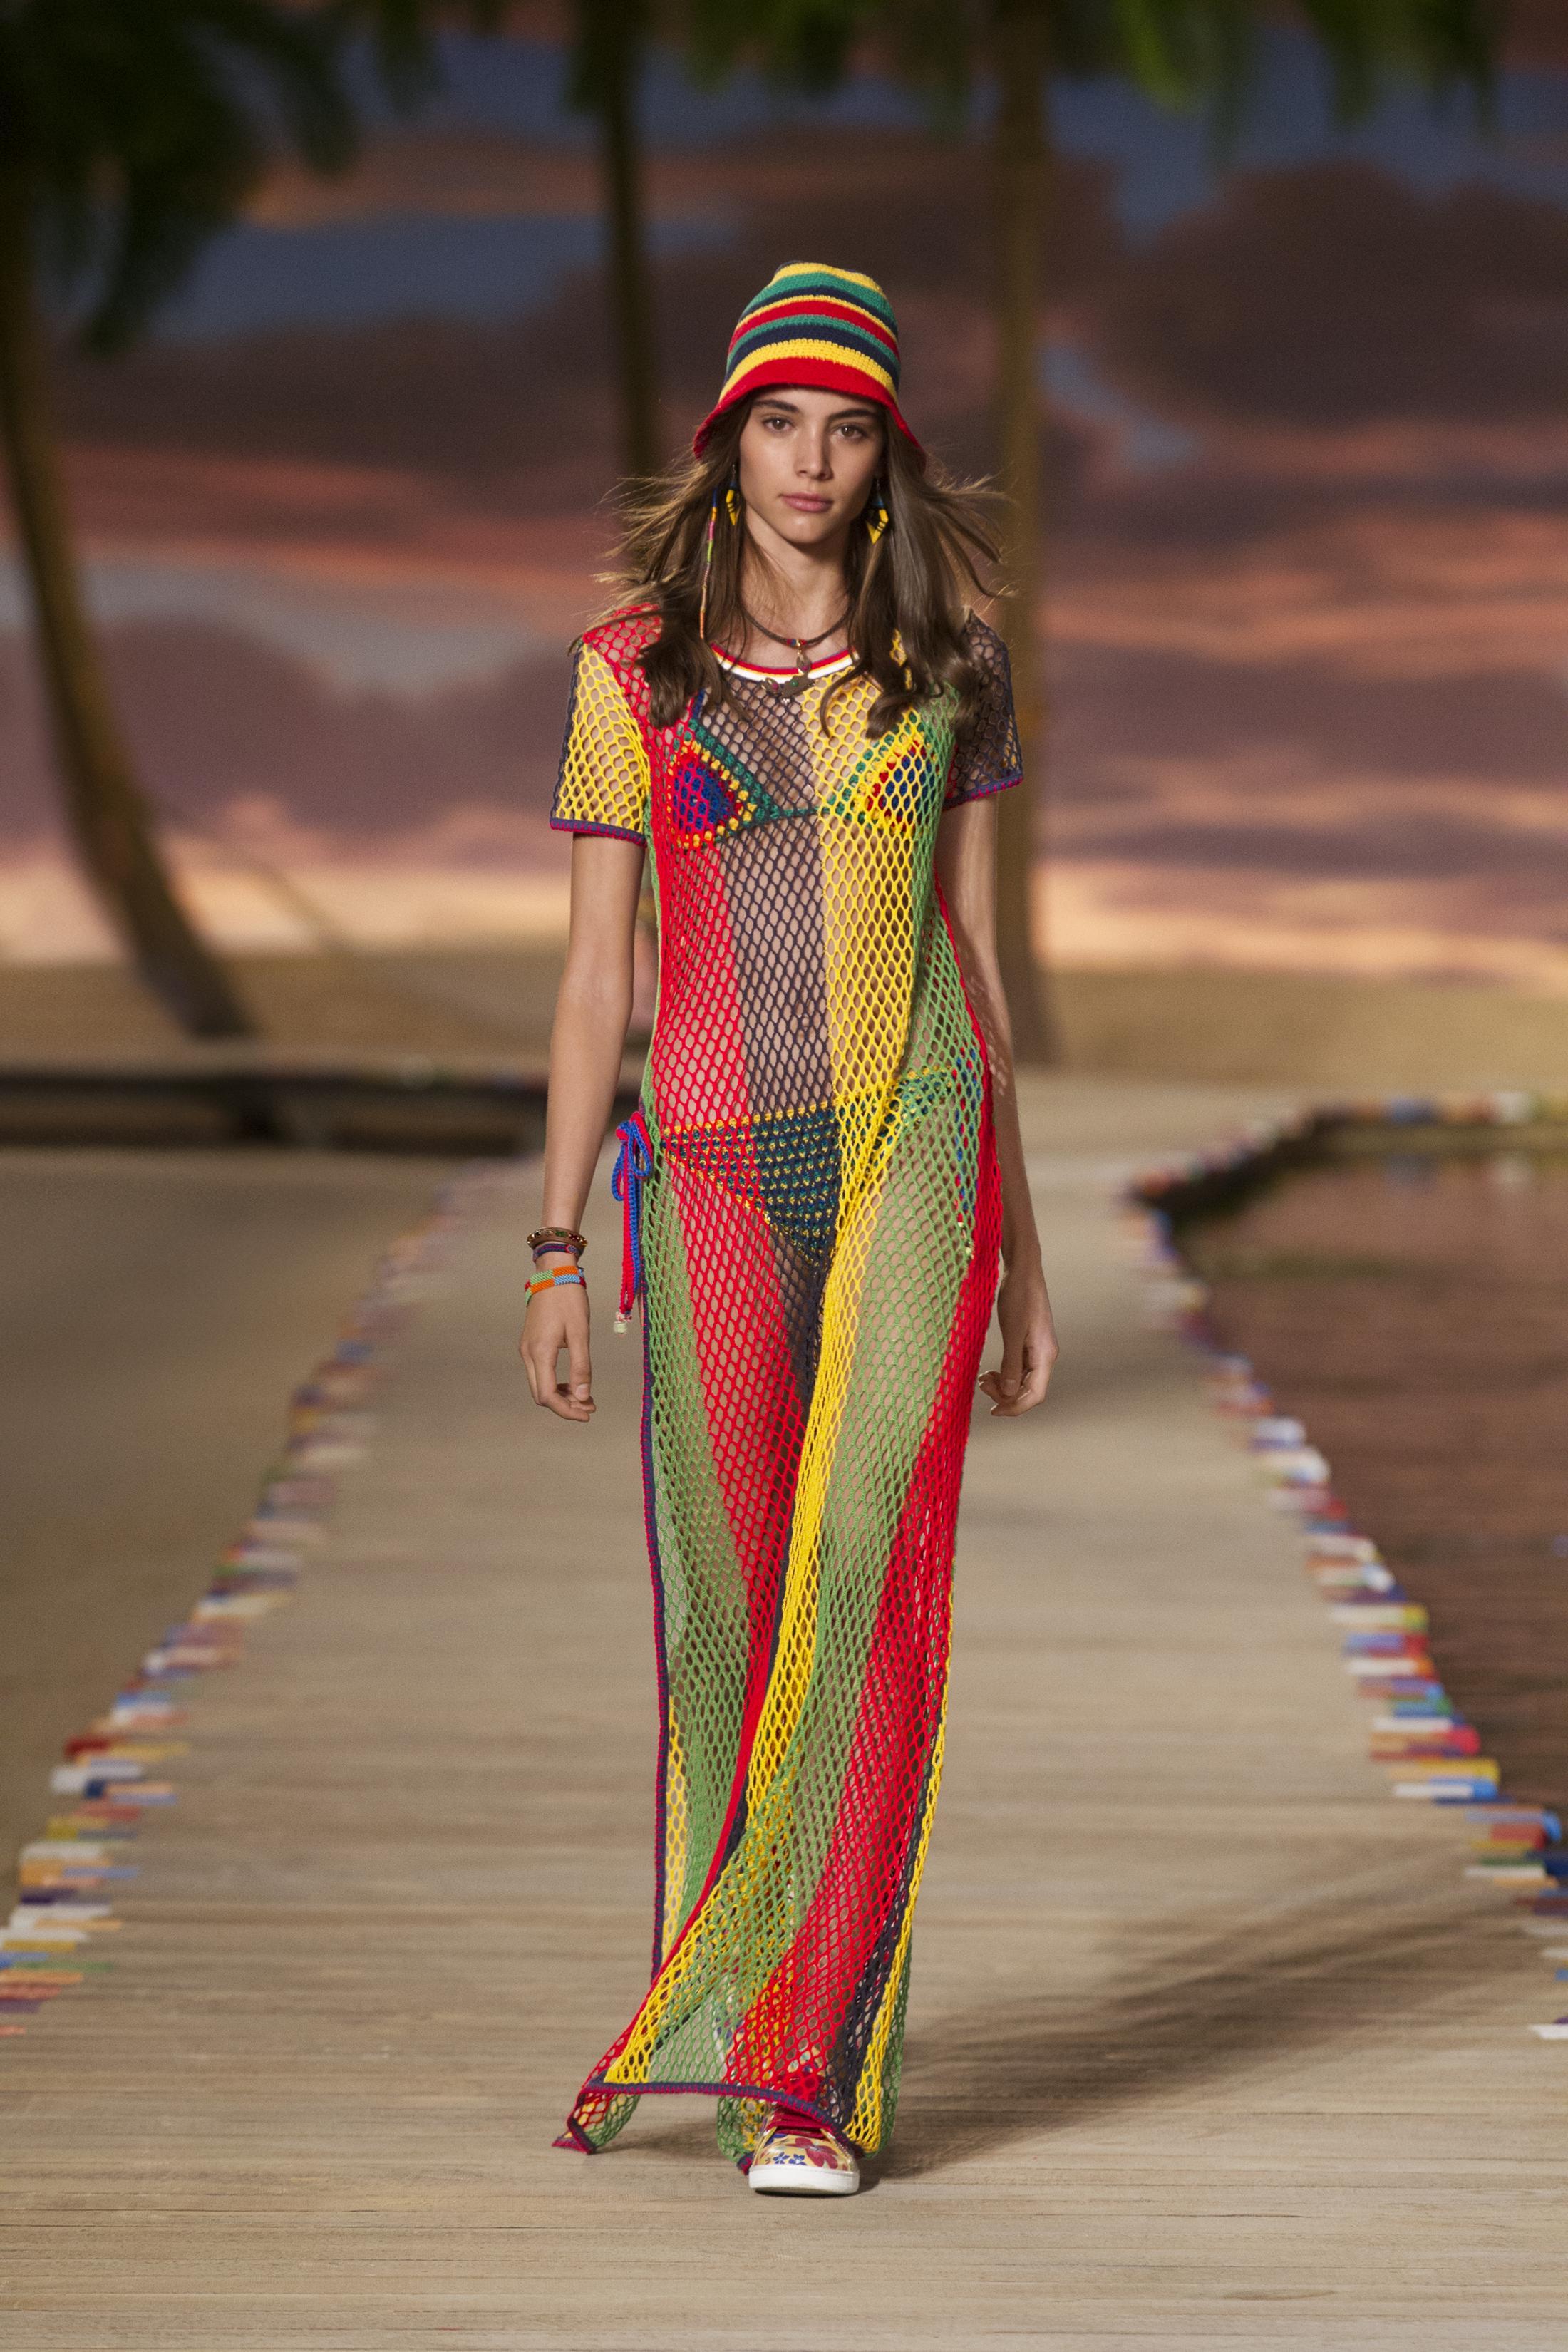 Mens Ladies Caribbean Pirate Captain Costume Fancy Dress ...  |Caribbean Party Clothes